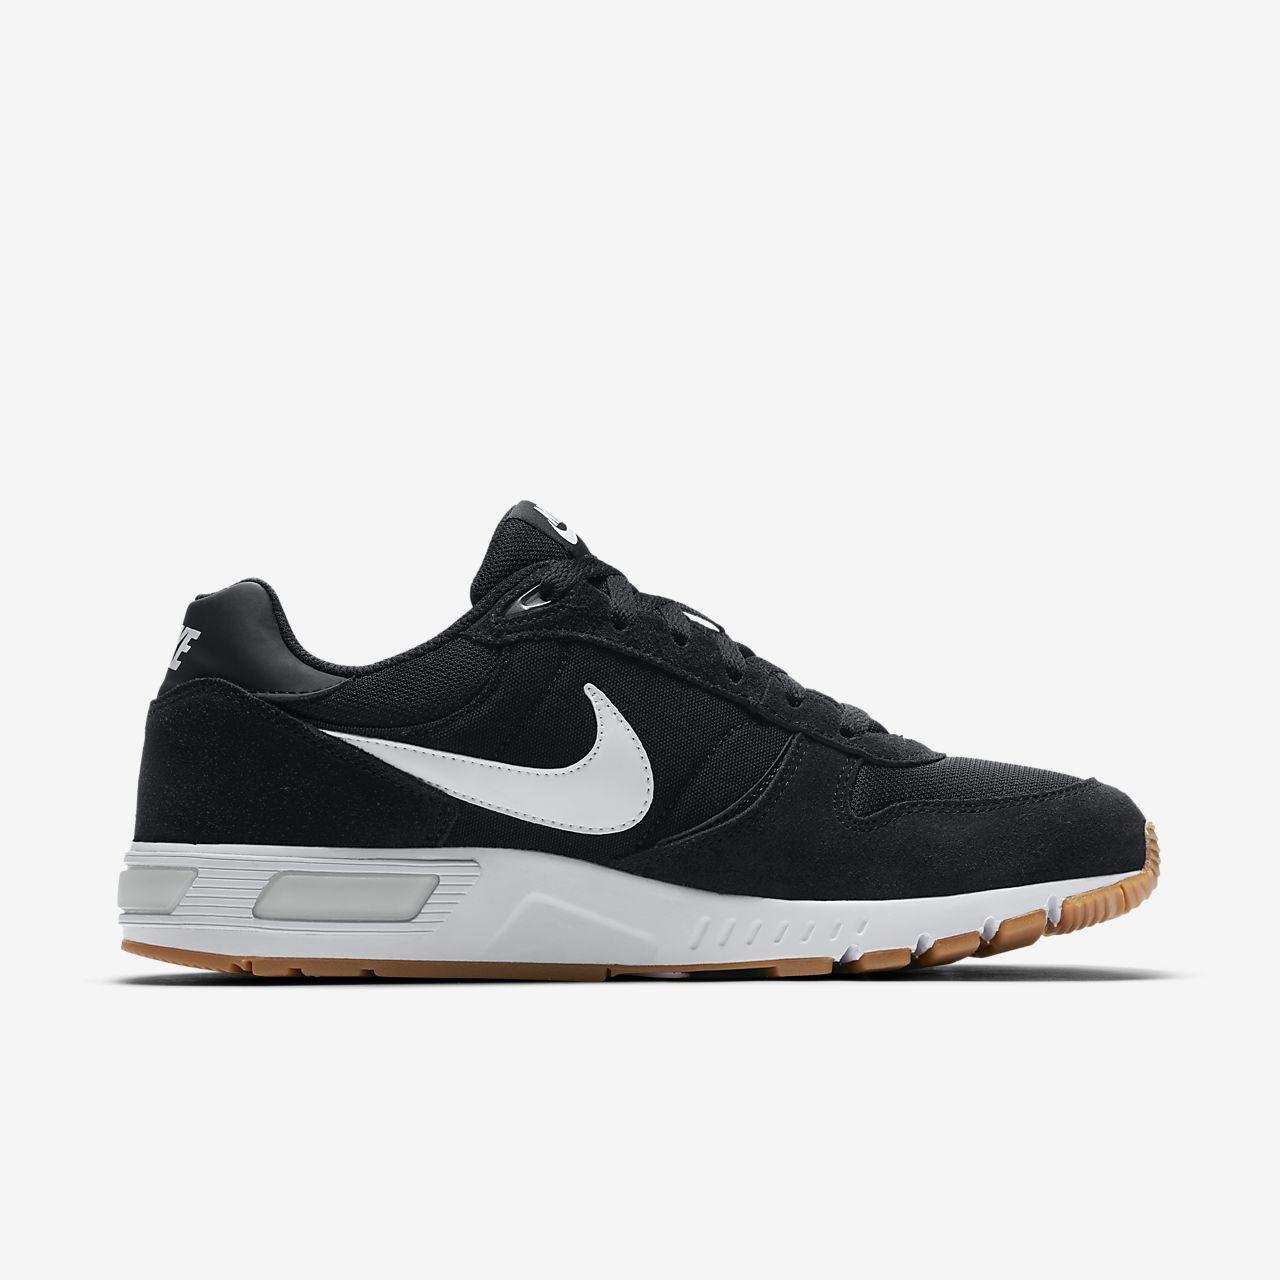 new concept 06342 42414 Nike Nightgazer Men s Shoe. Nike.com CA